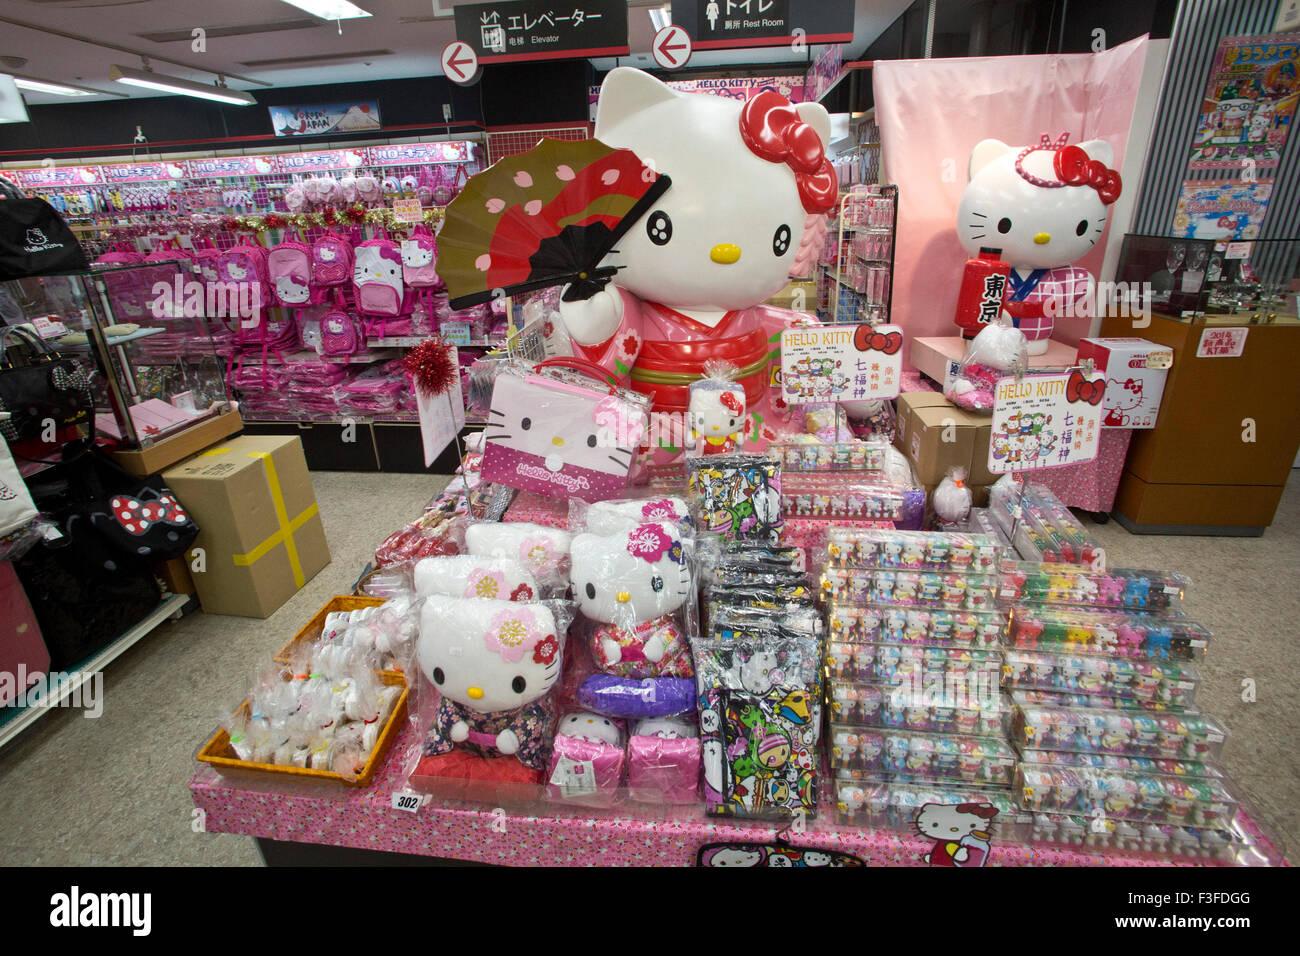 7e4ec032b Hello Kitty Shop Stock Photos & Hello Kitty Shop Stock Images - Alamy